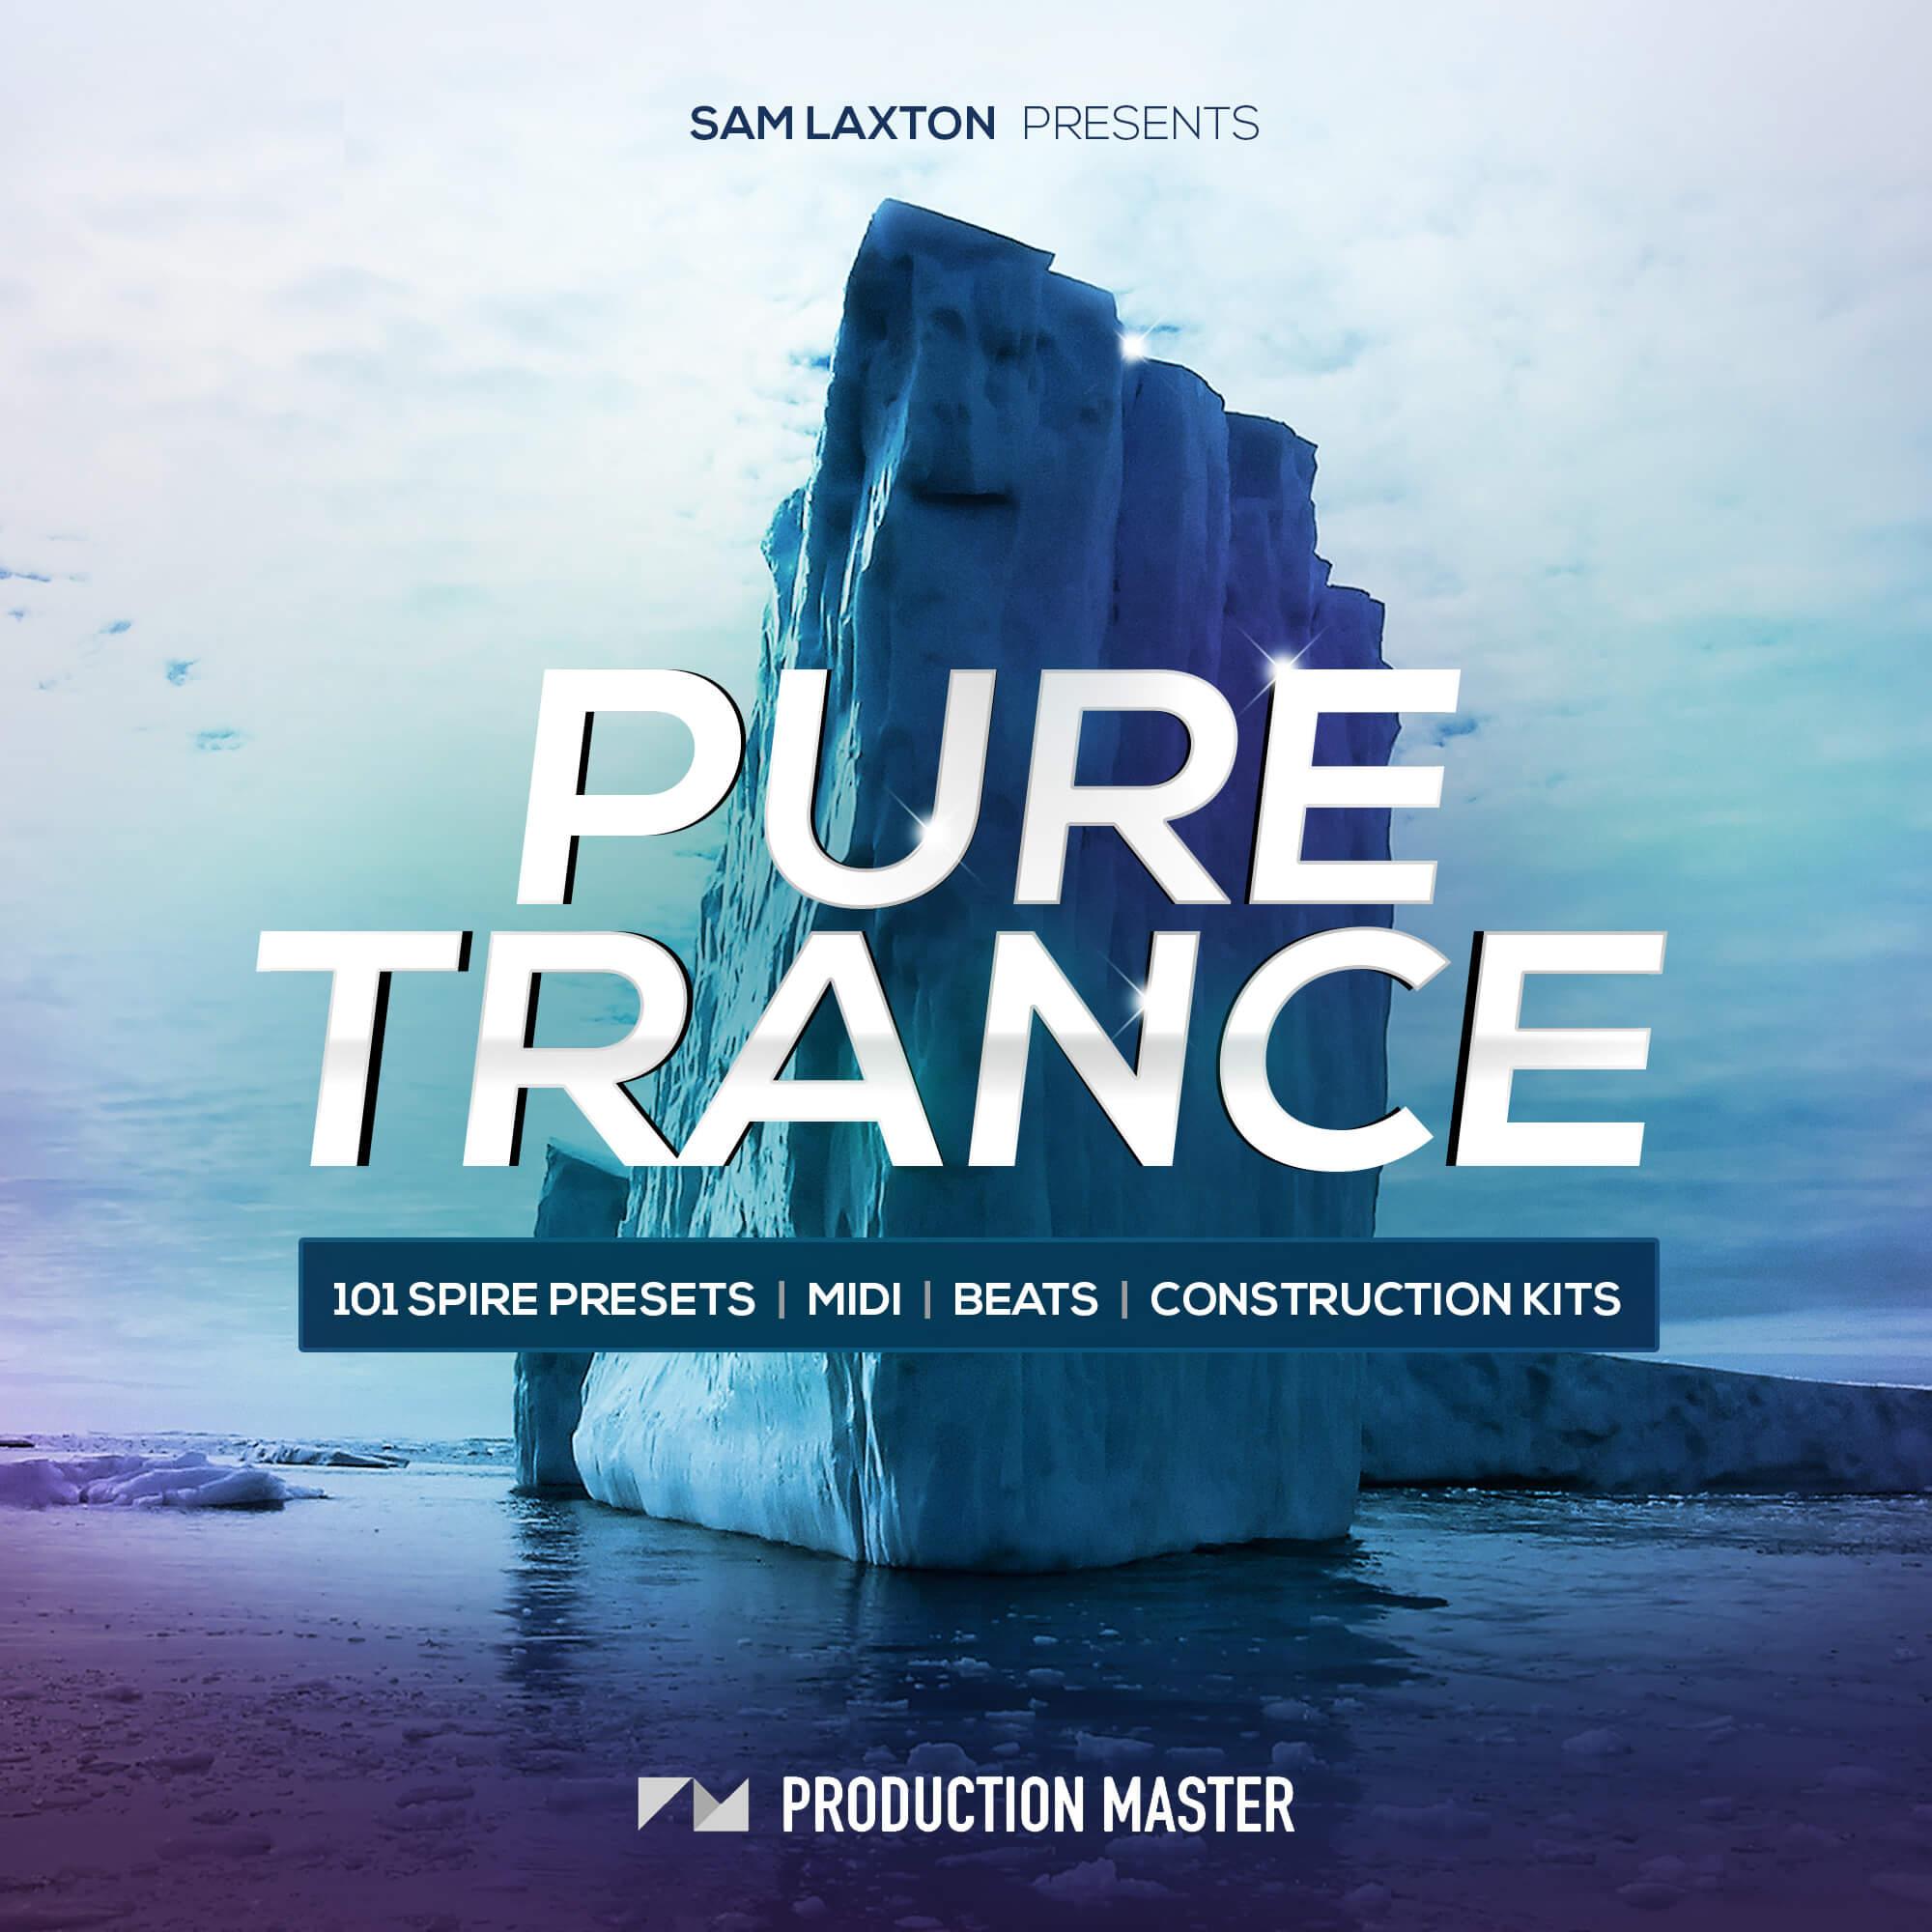 Sam Laxton - Pure Trance